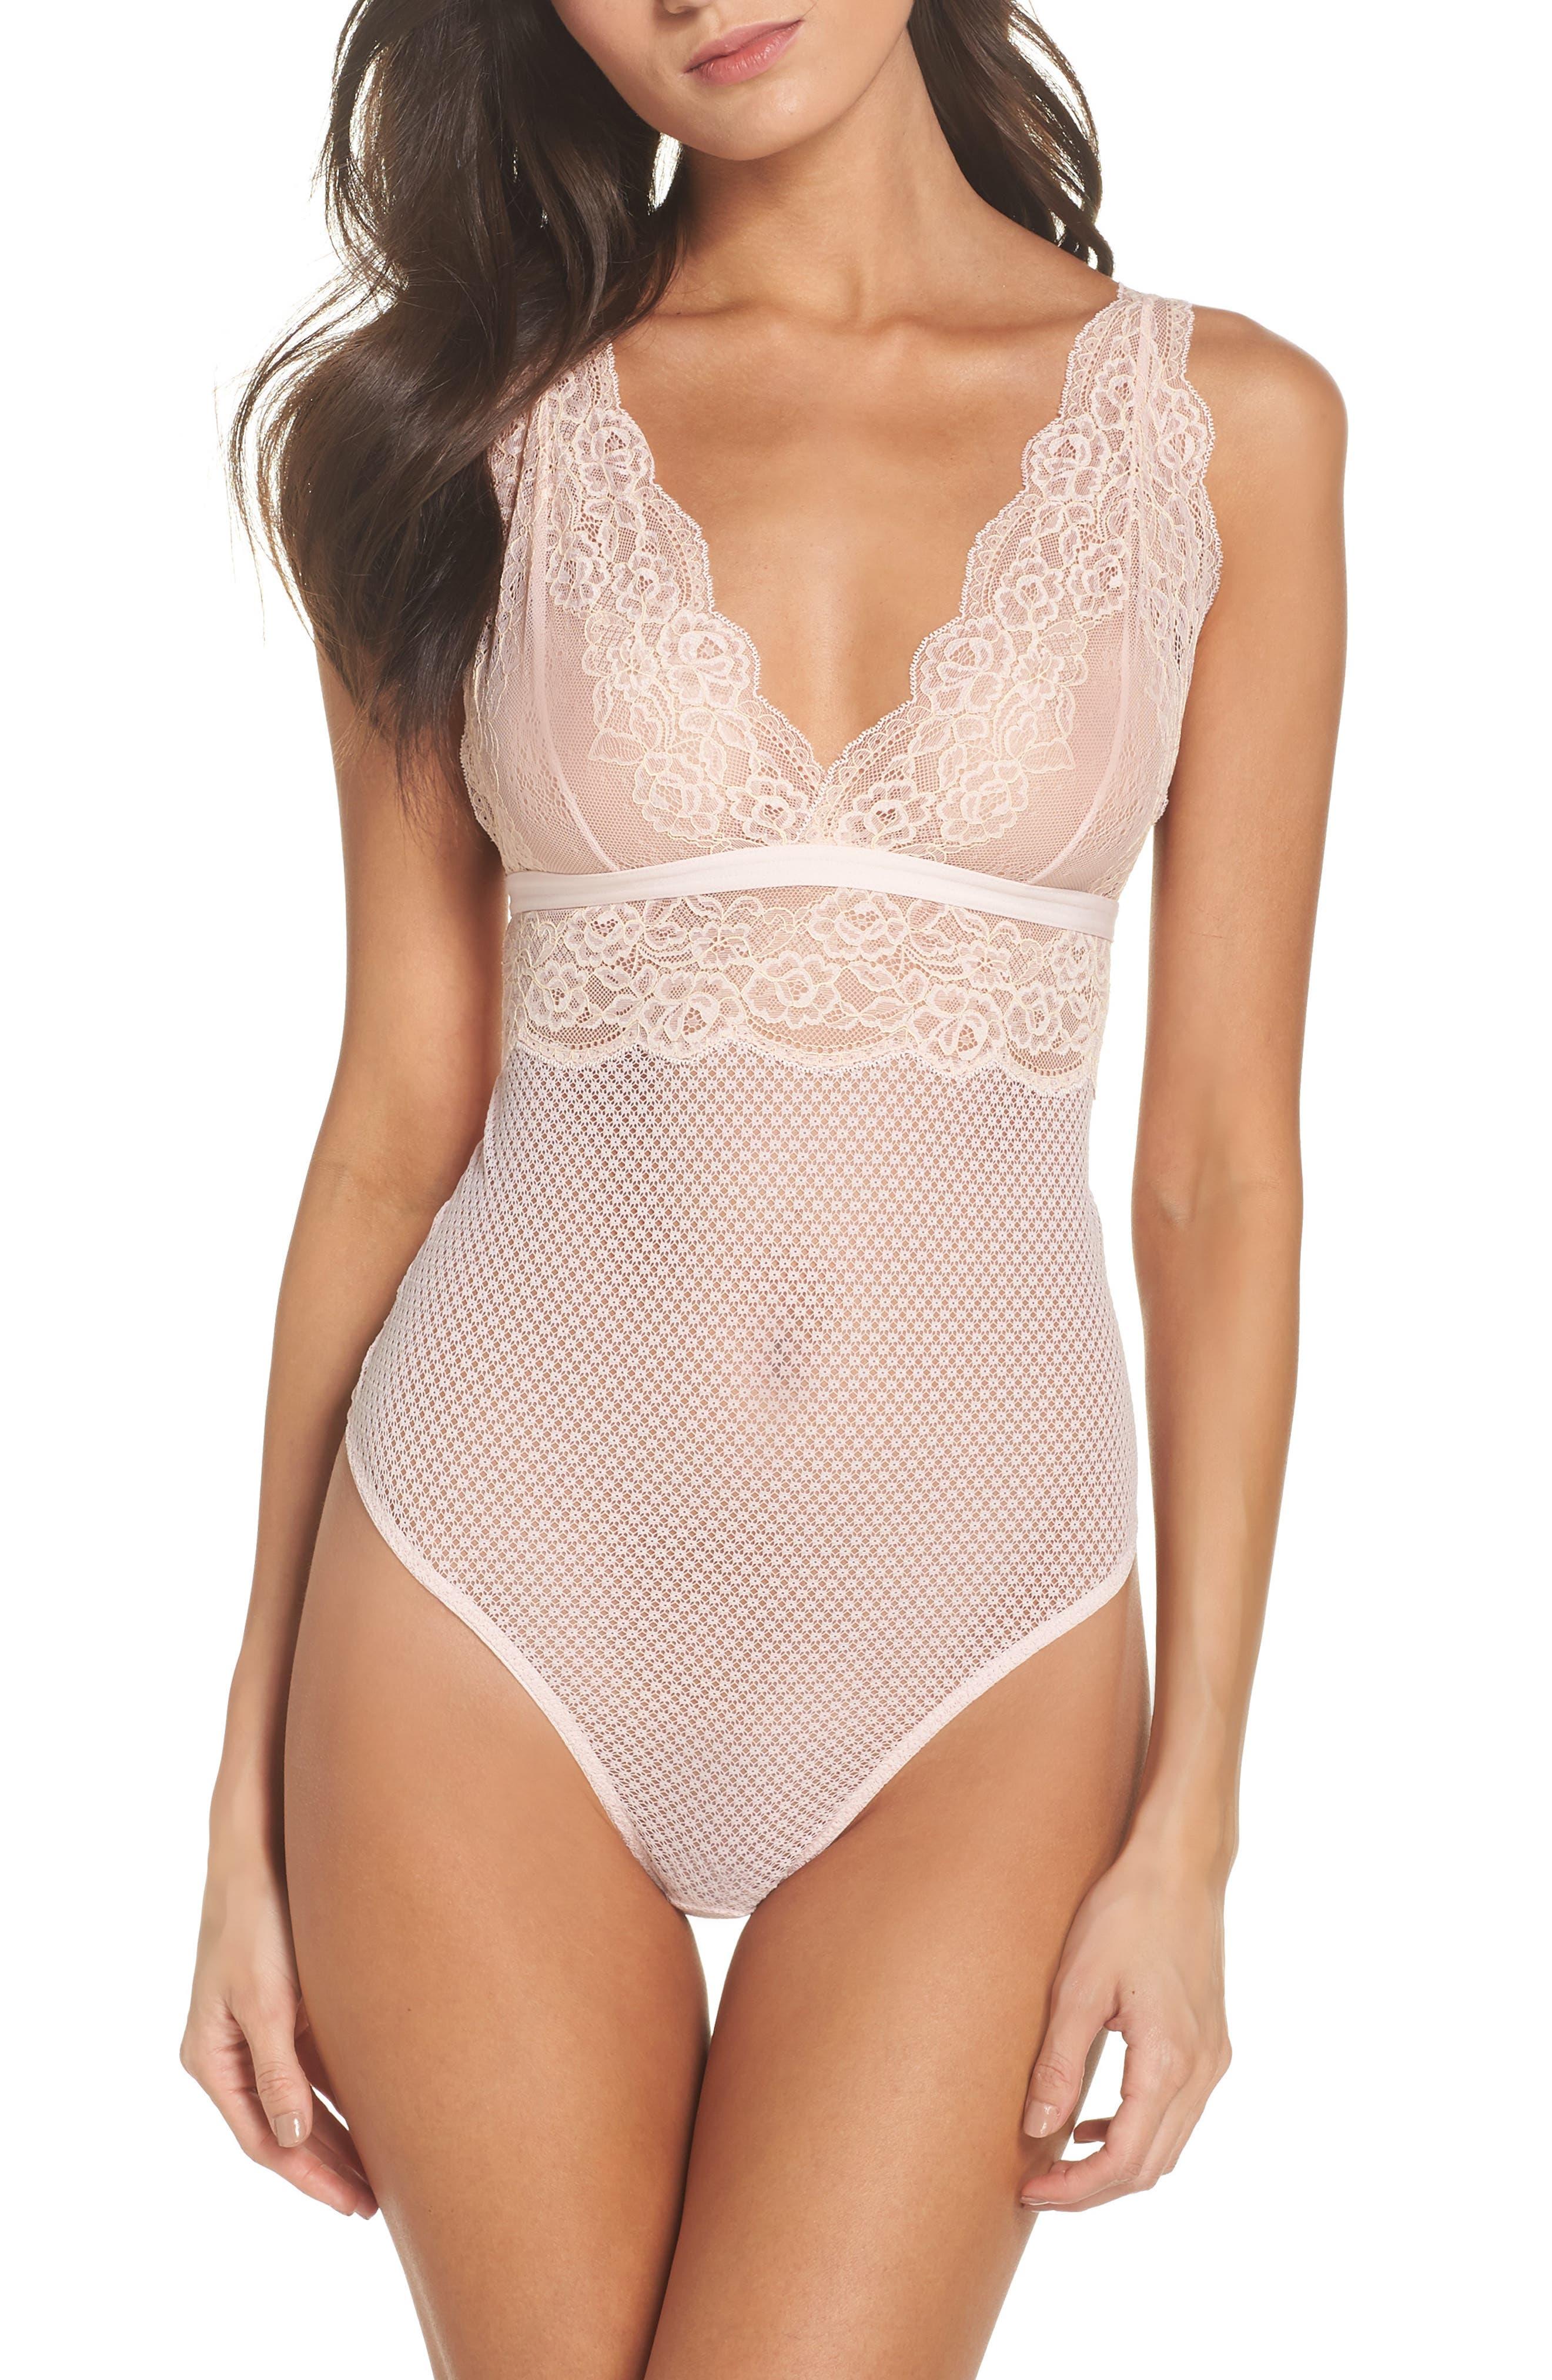 Erica Lace Thong Bodysuit,                         Main,                         color, 650